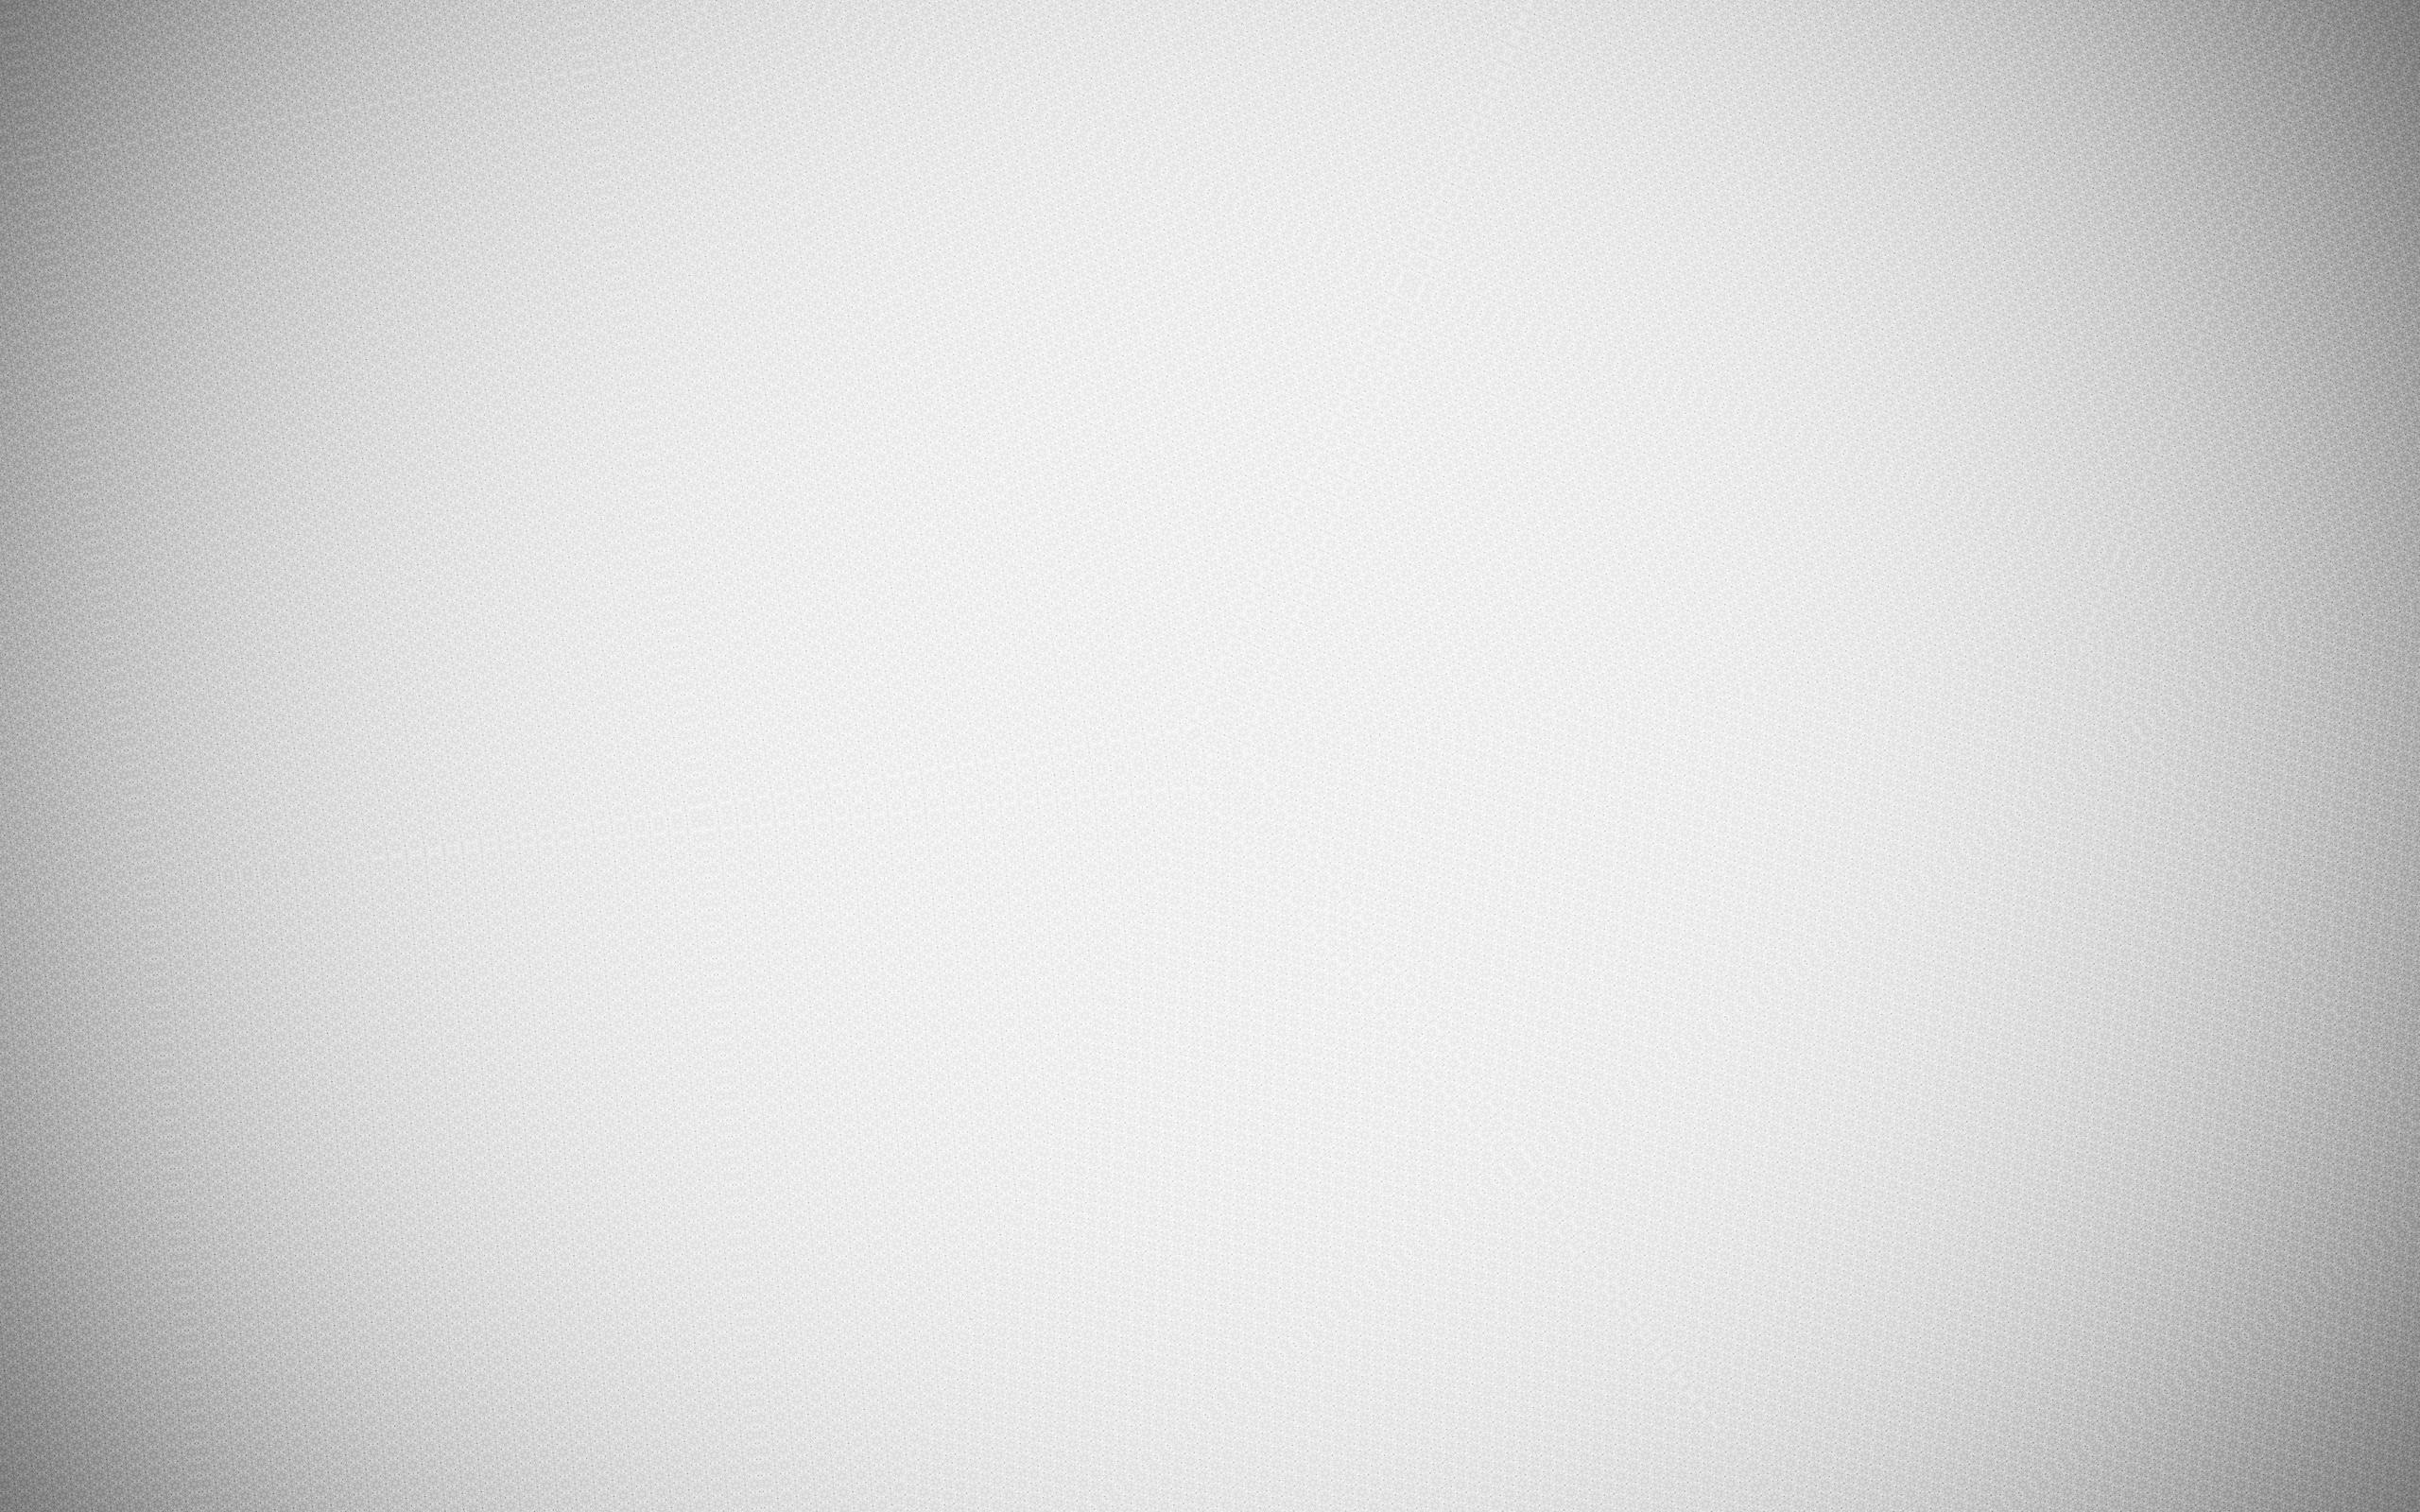 graybackgroundleaflightbrightcolorshdwallpaper